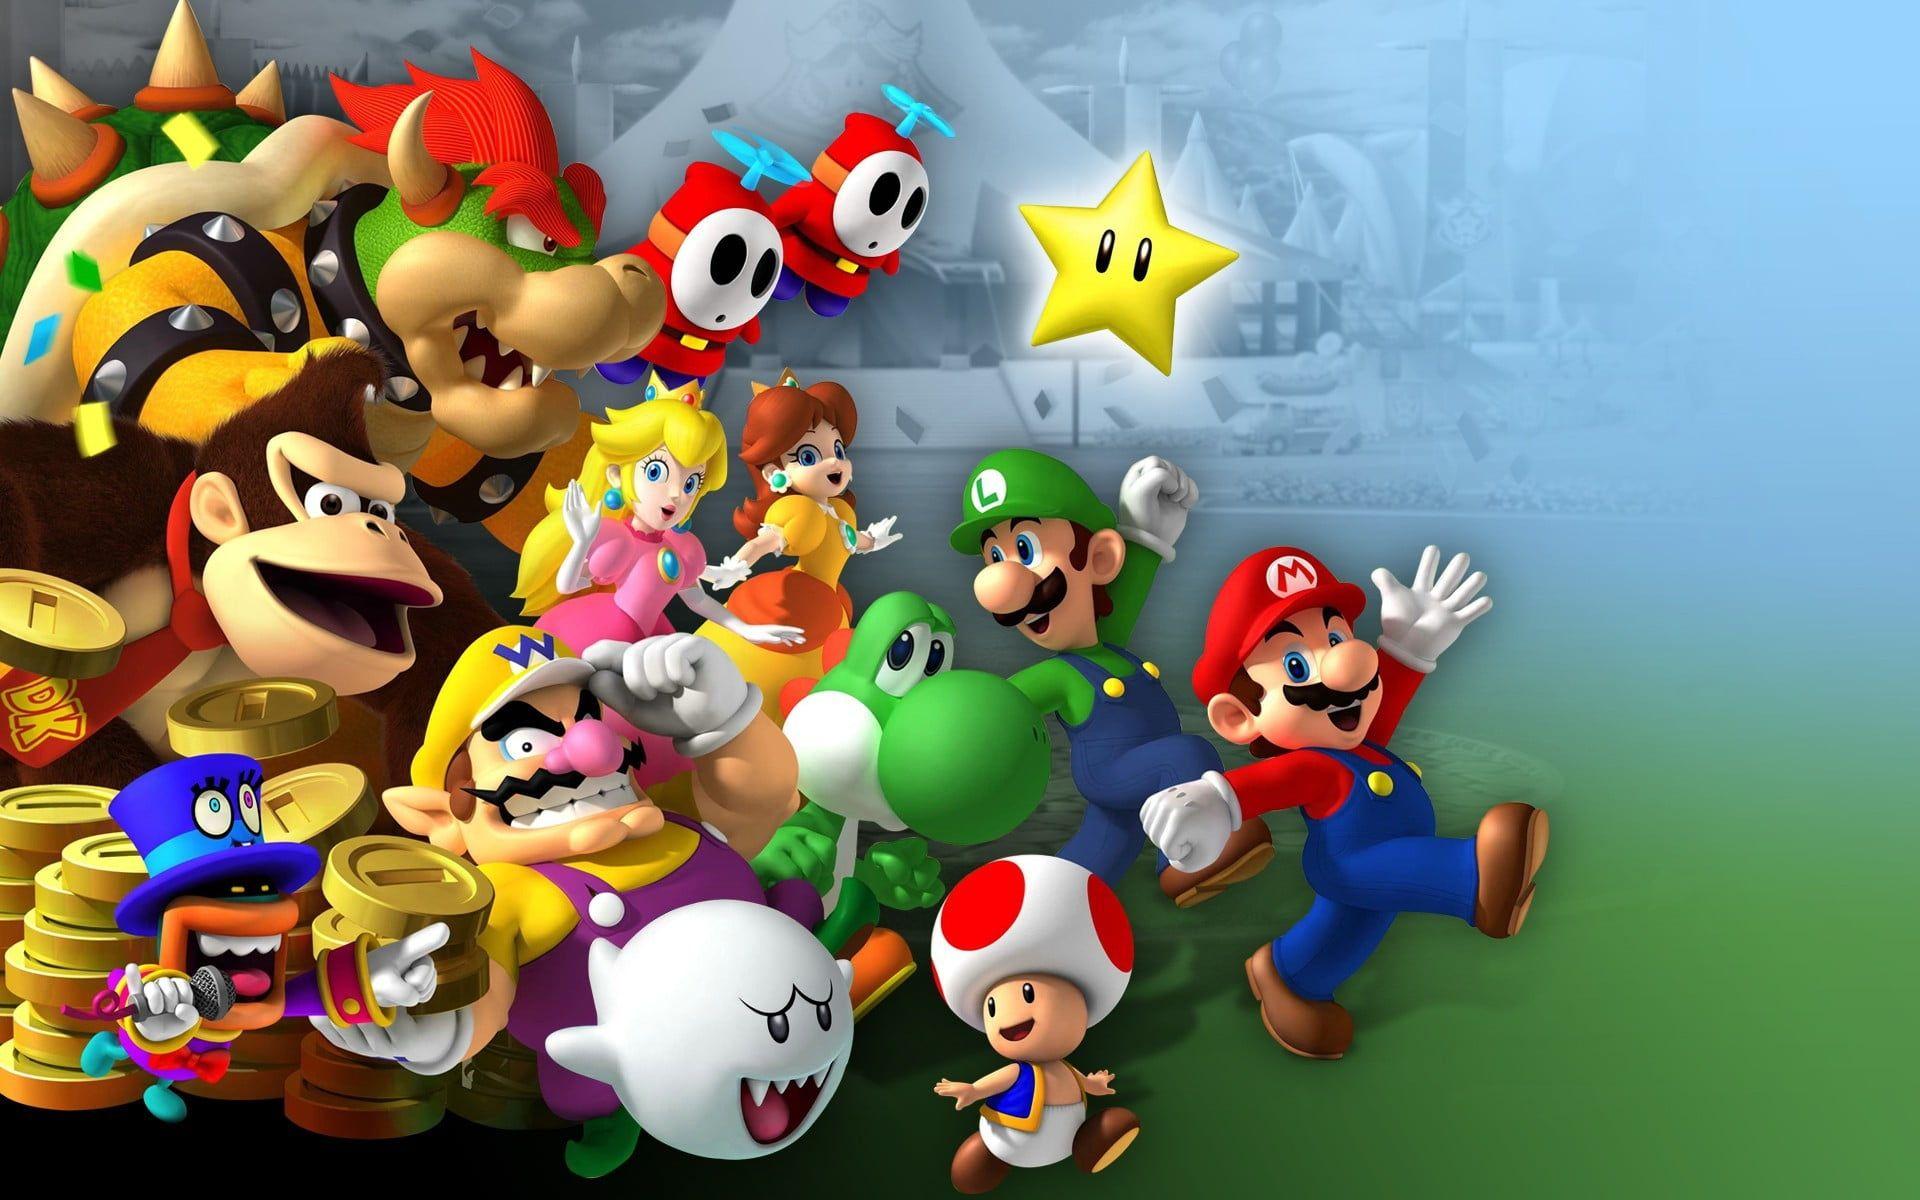 Super Mario Characters Illustration Mario Bros Luigi Princess Peach Yoshi Wario Donkey Kong Toad Character Video Game Mario E Luigi Mario Parque Tematico